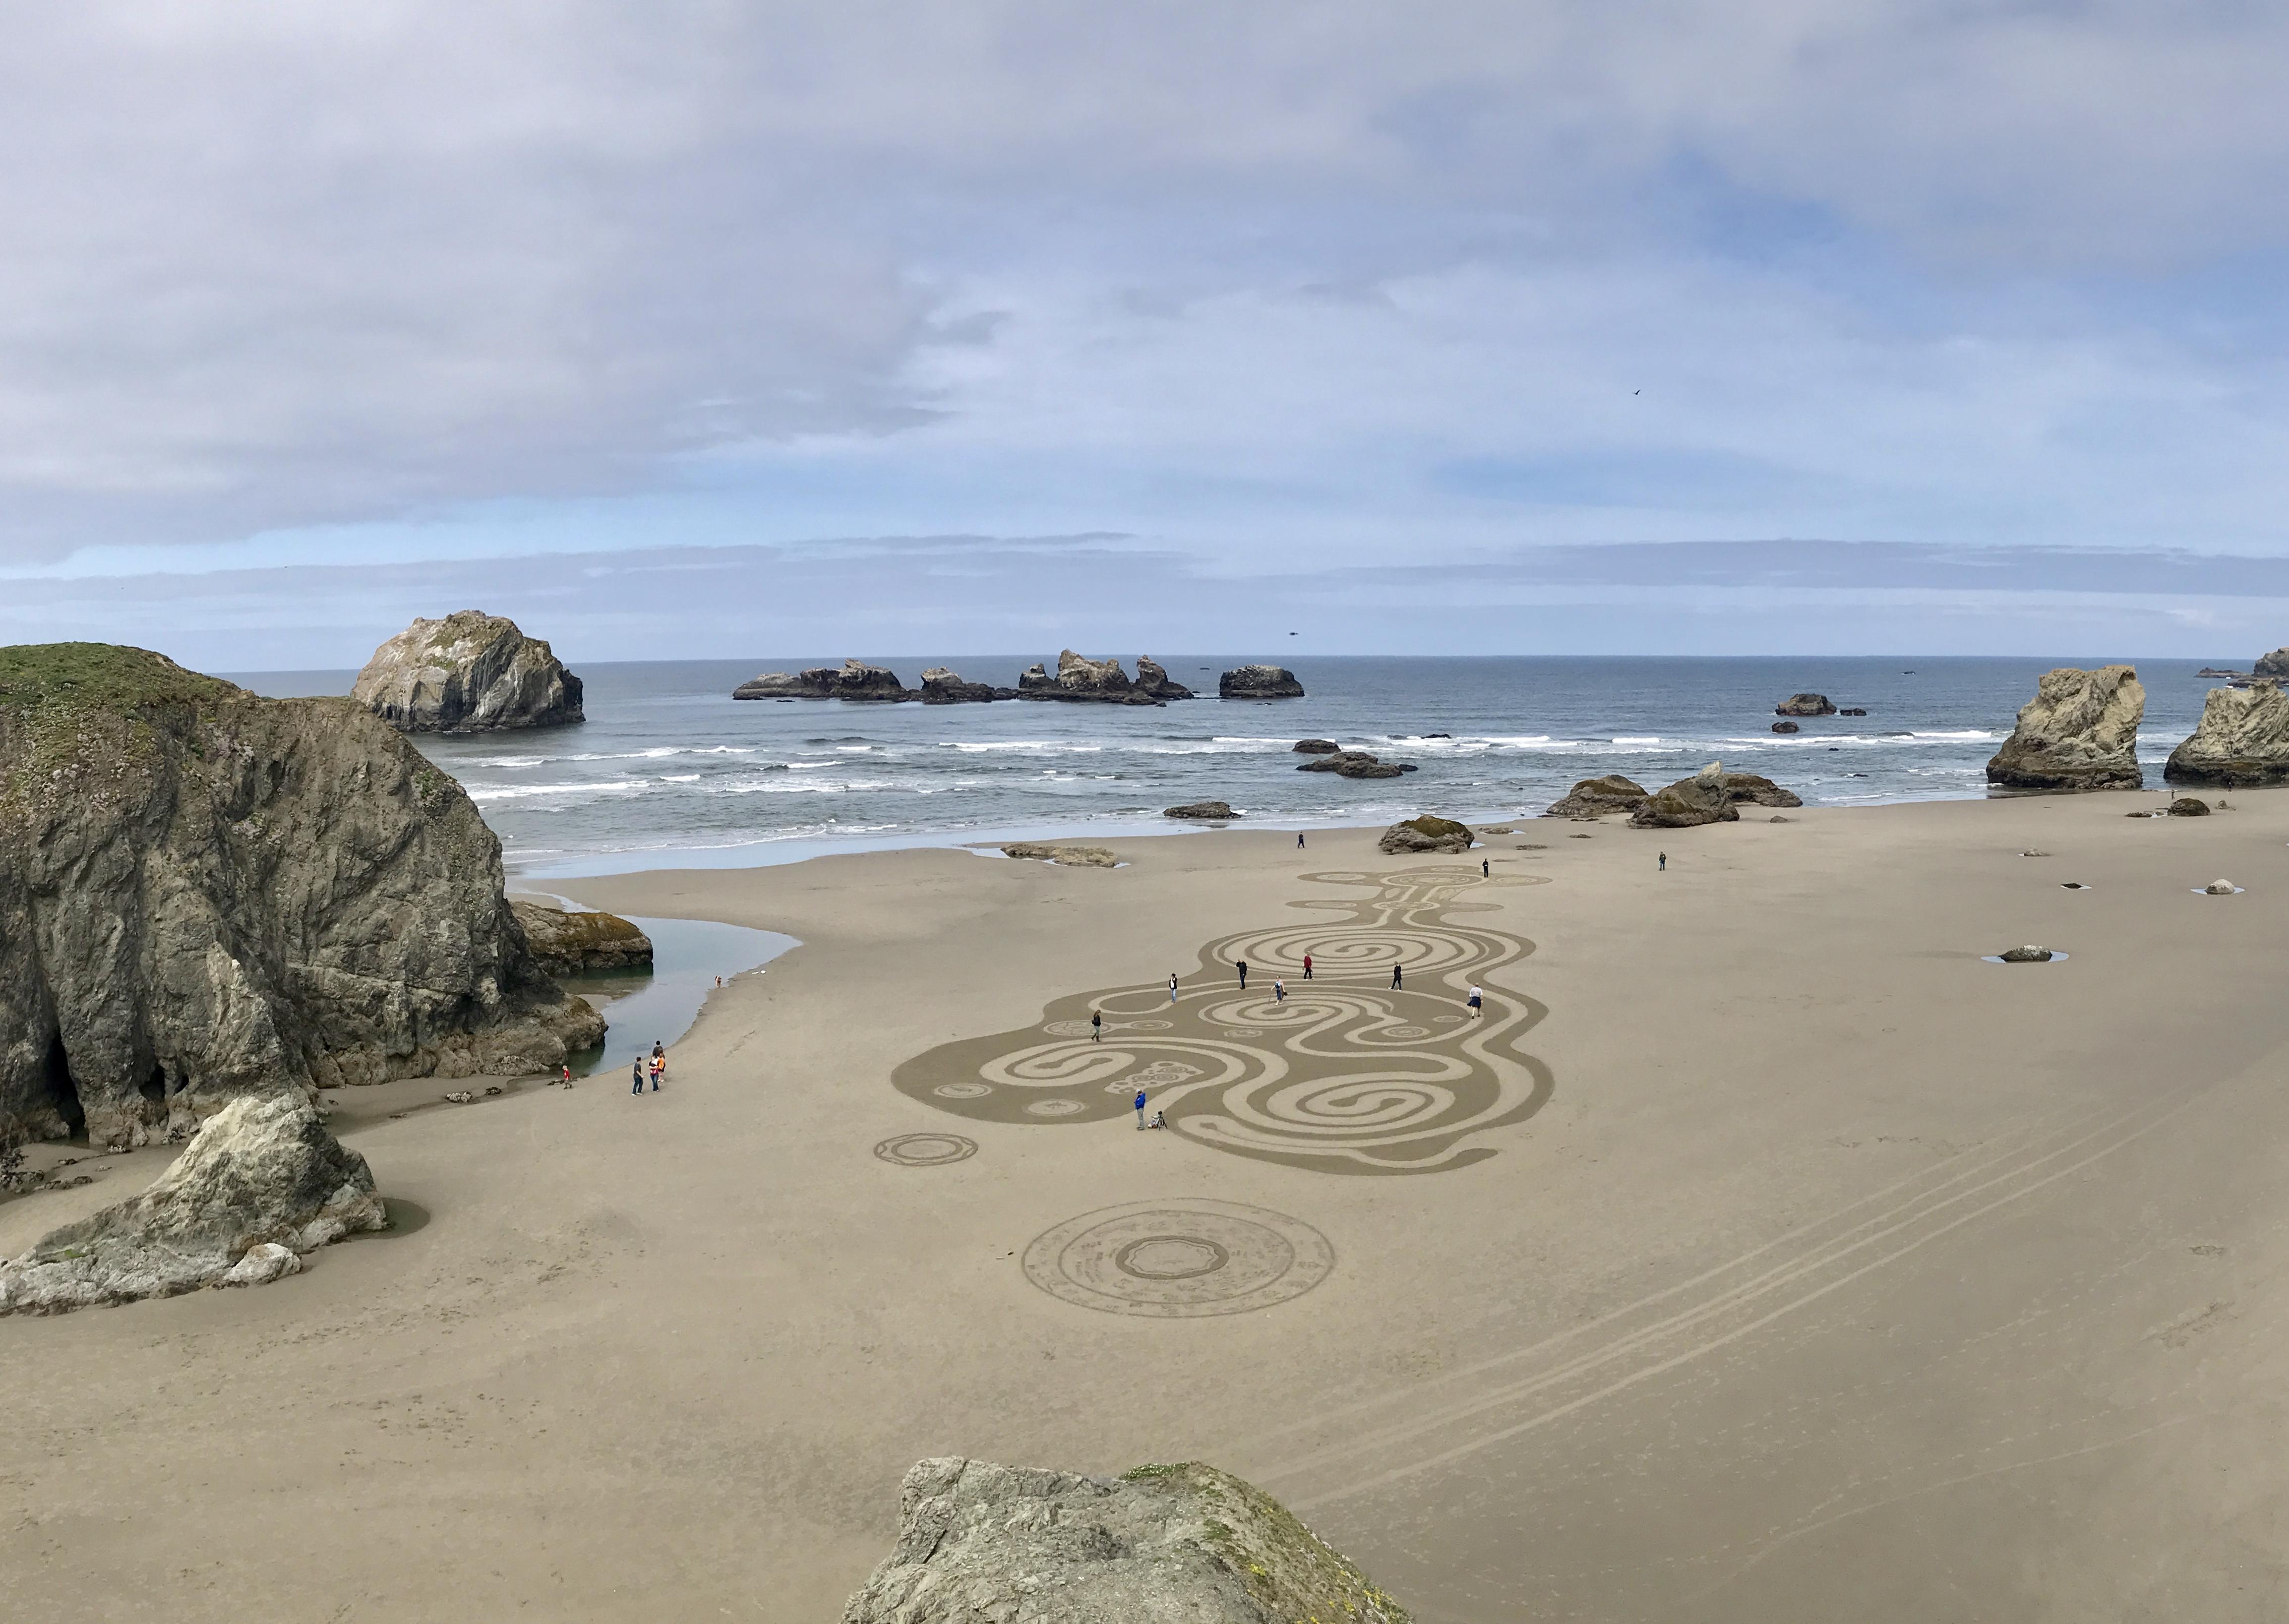 Circles drawn into the sand at a beach.